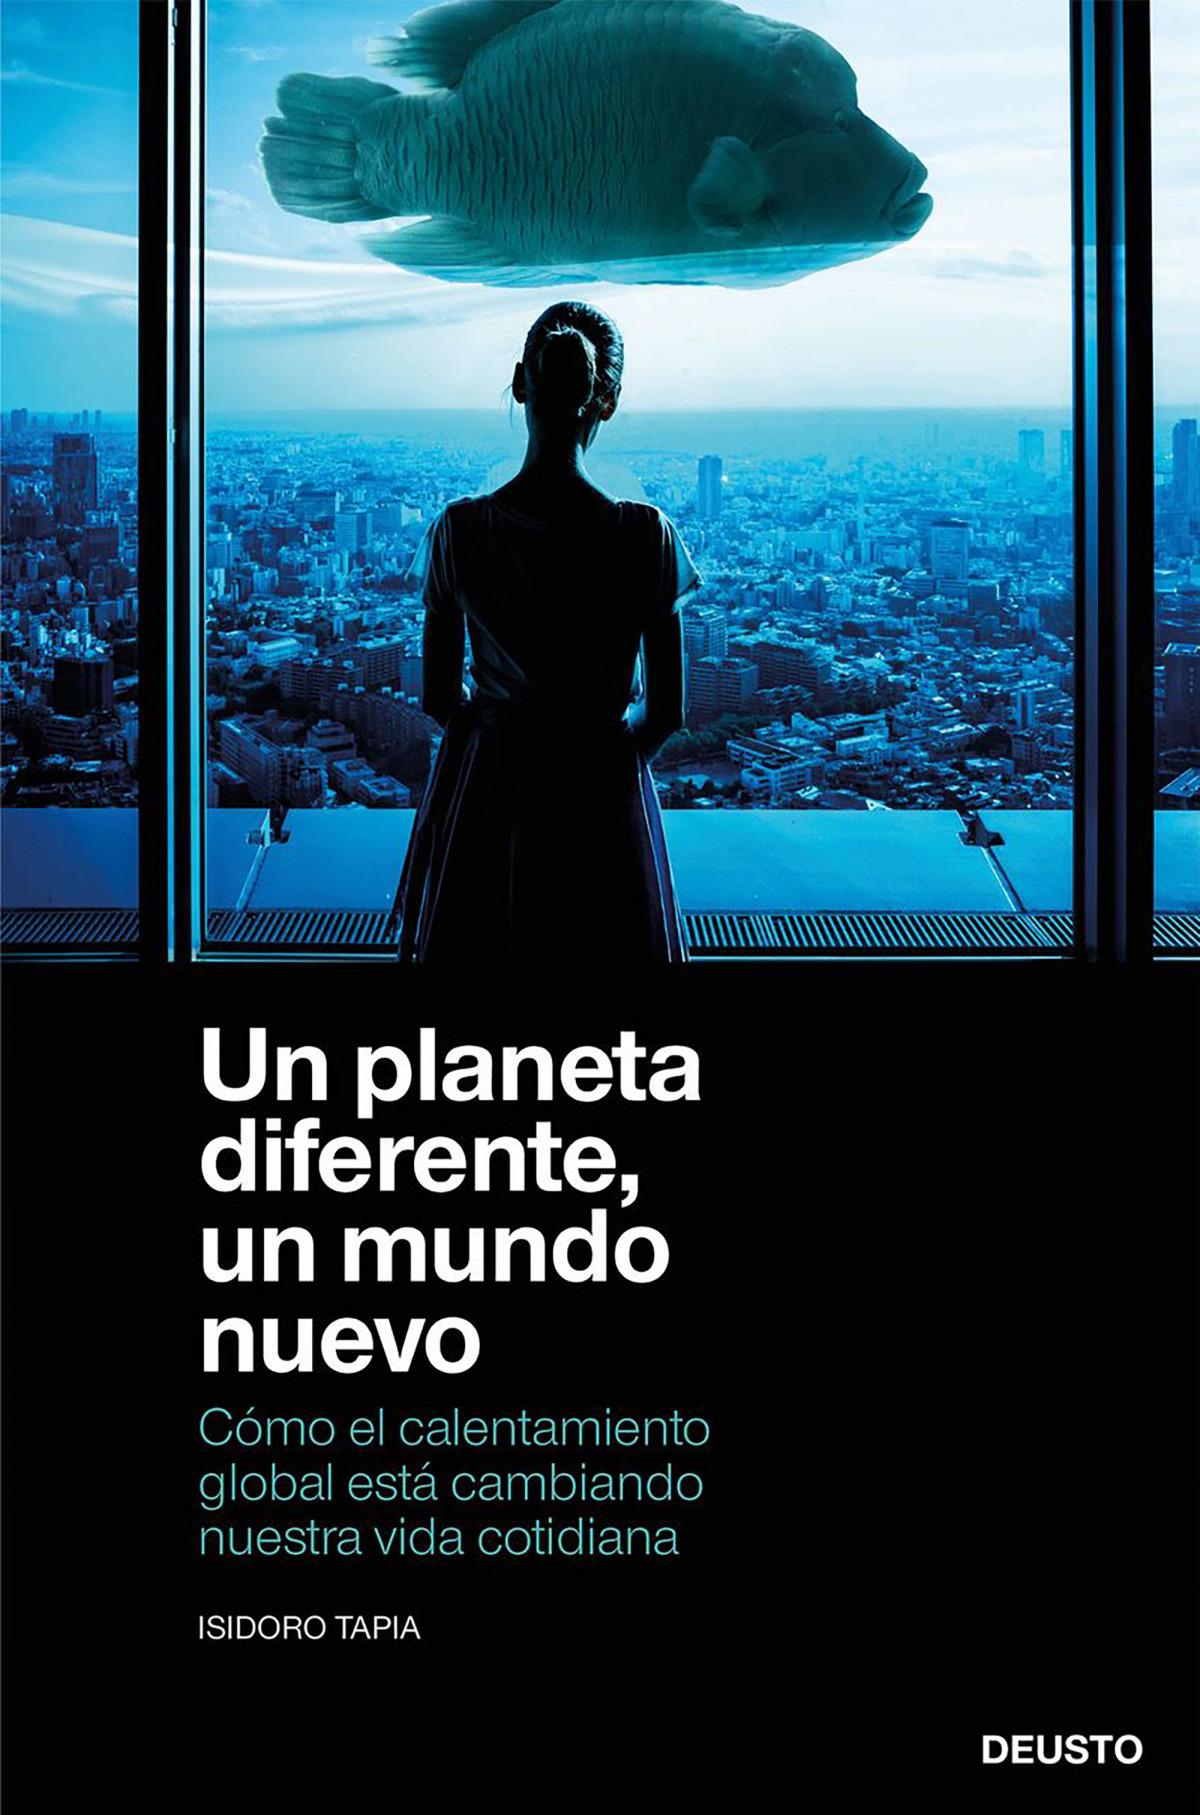 Un planeta diferente, un mundo nuevo